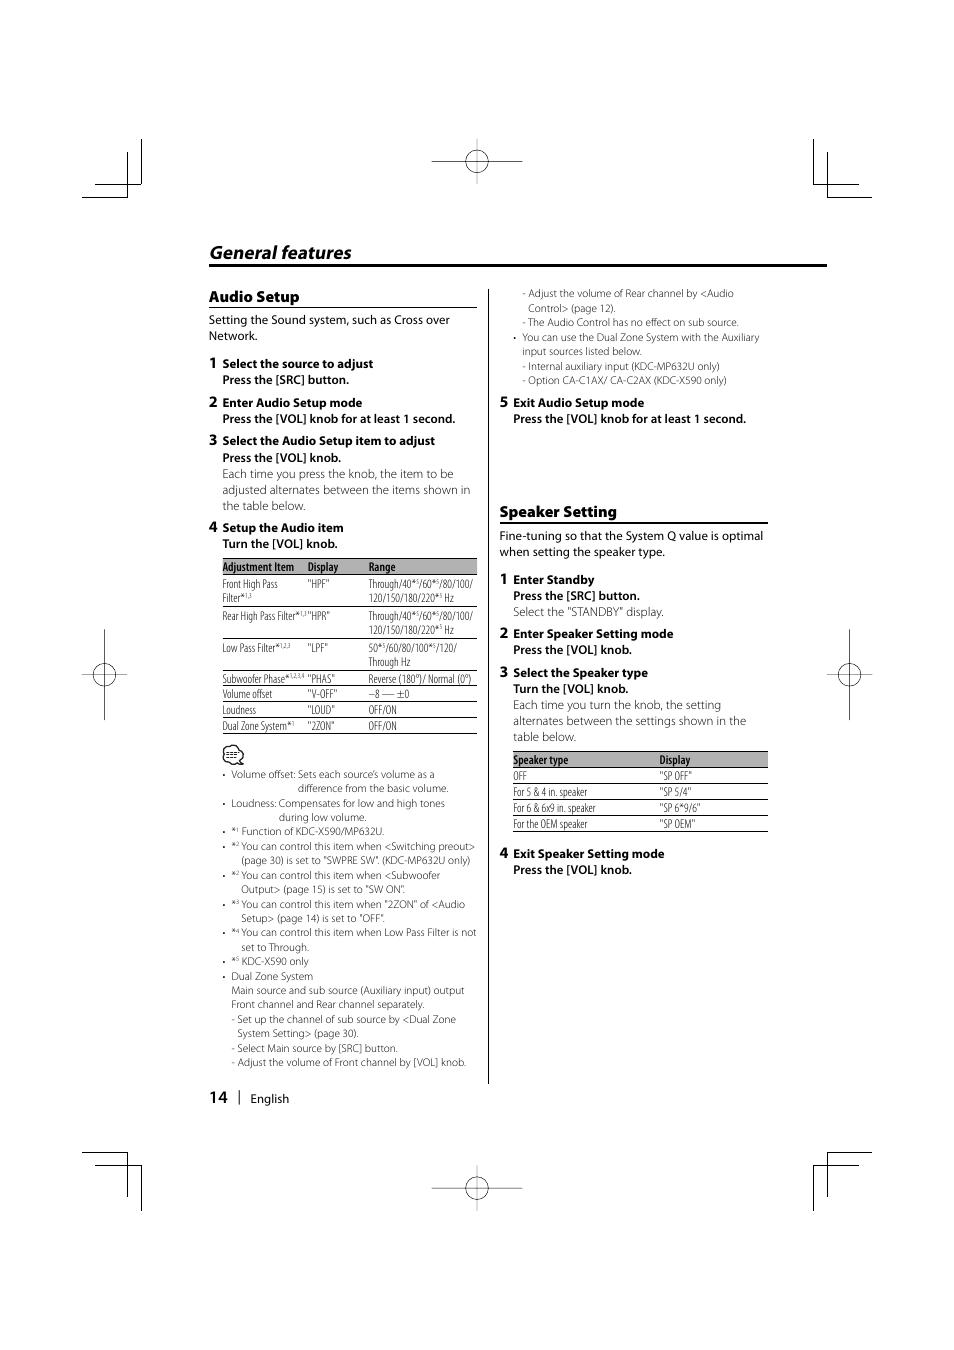 Kenwood kdc-x590 manual on